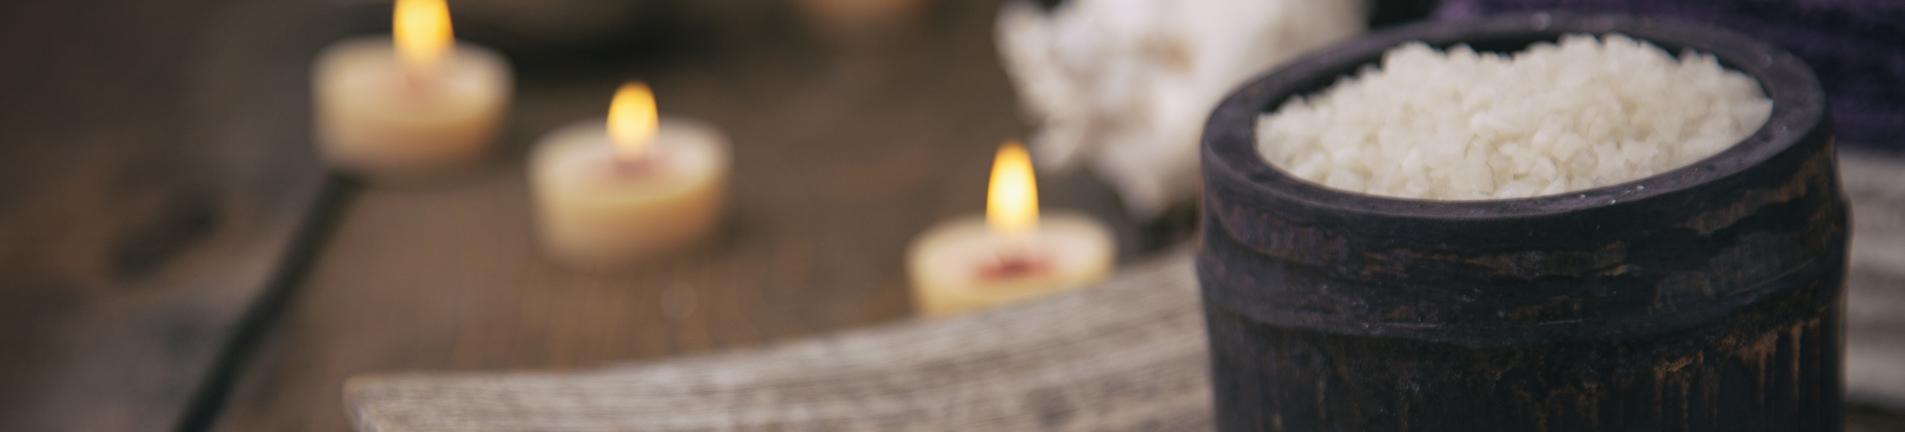 cabecera-aromaterapia